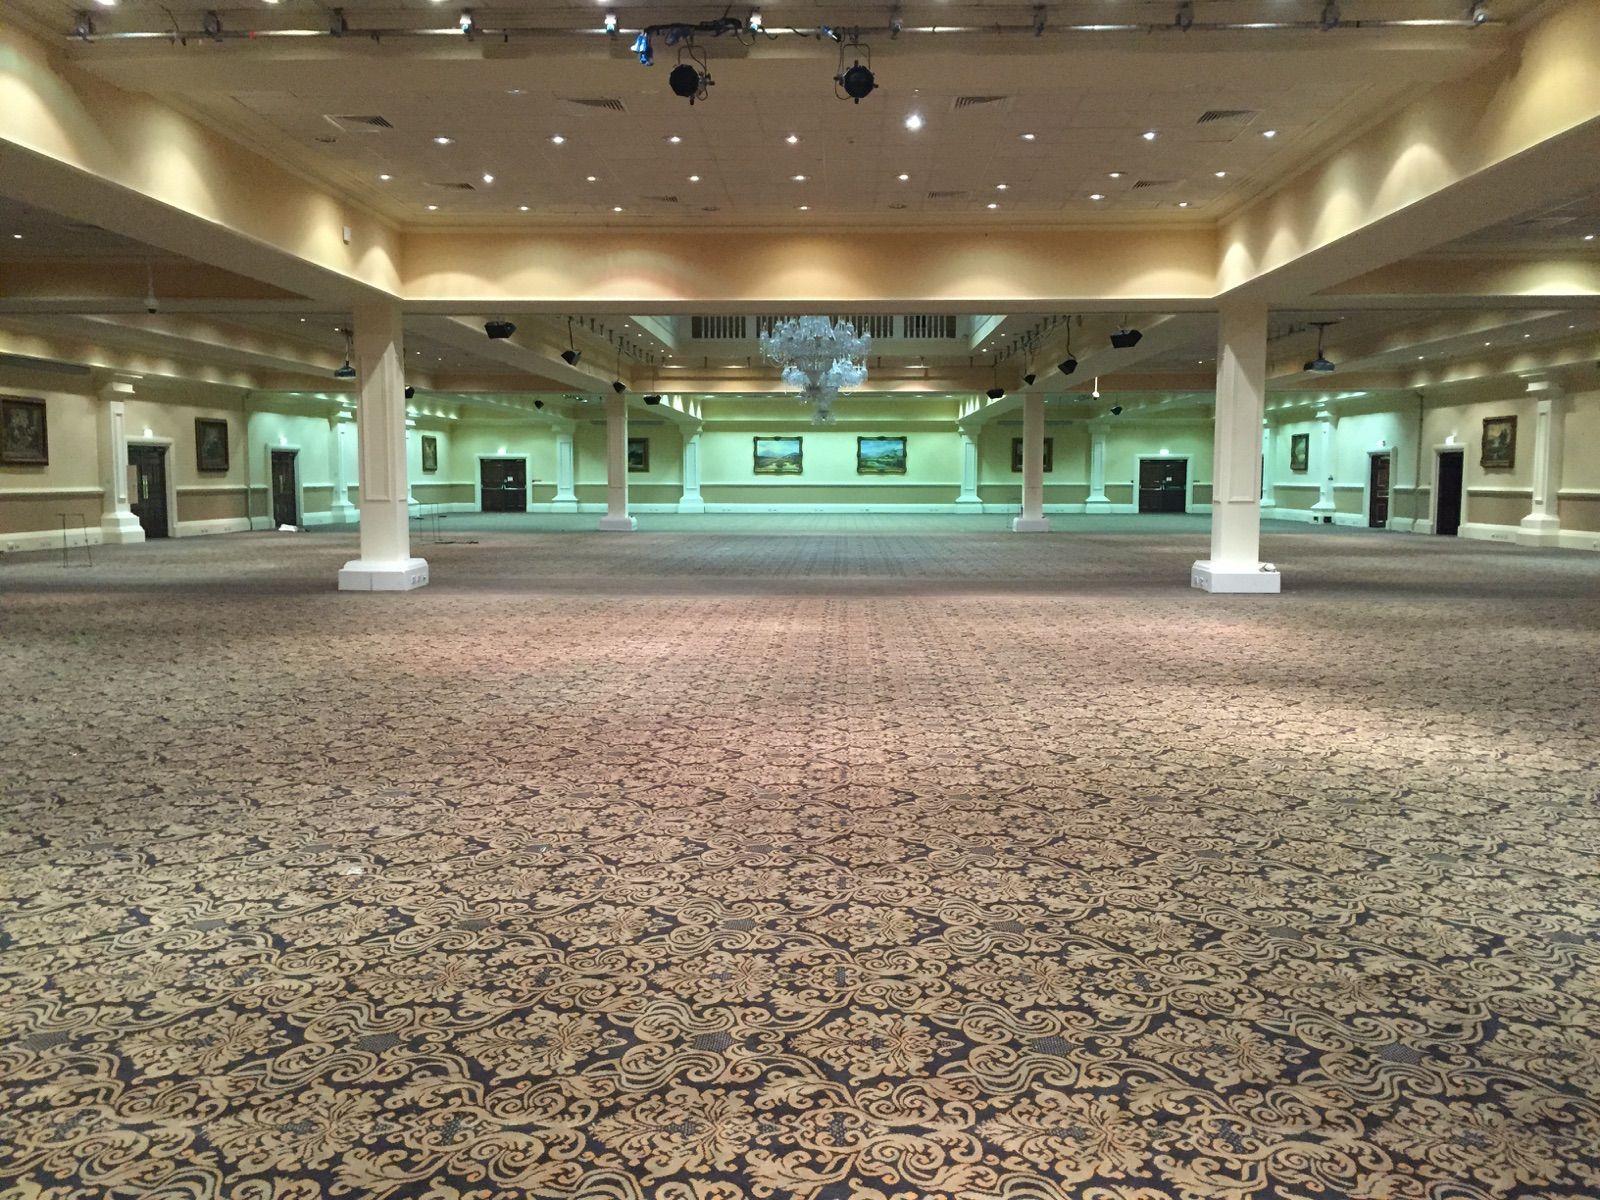 Custom Manufactured 10 Row Axminster City West Hotel Ballroom Carpet Tiles Commercial Carpet Commercial Flooring